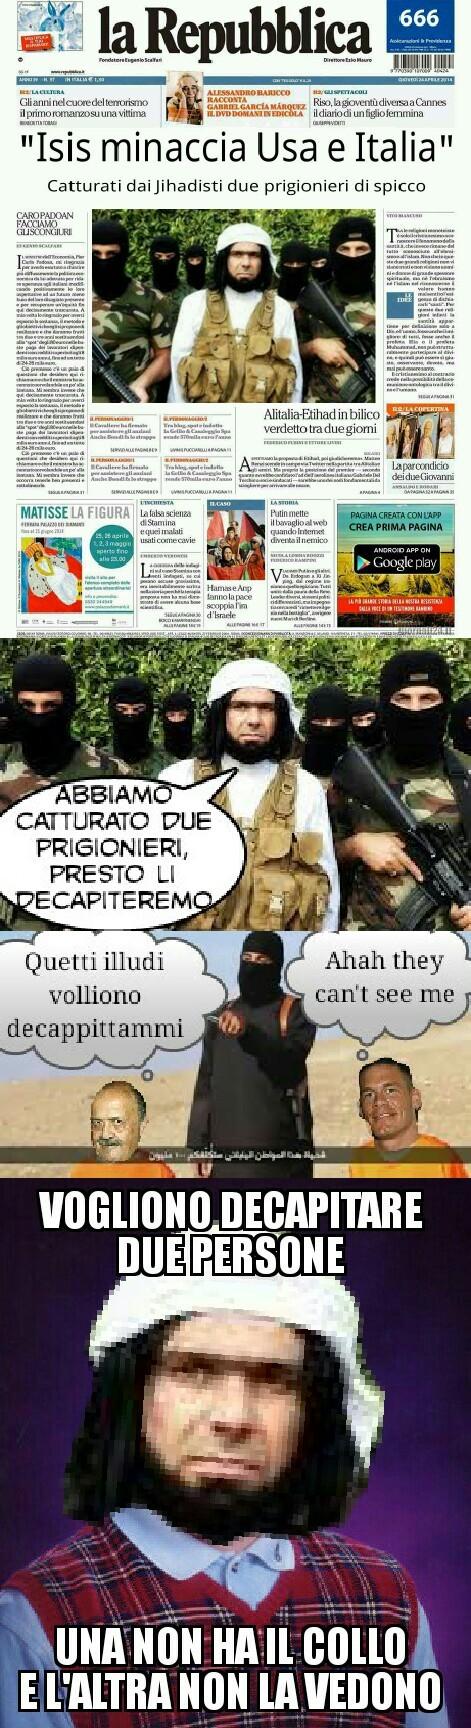 #IsisTrollingDay - meme